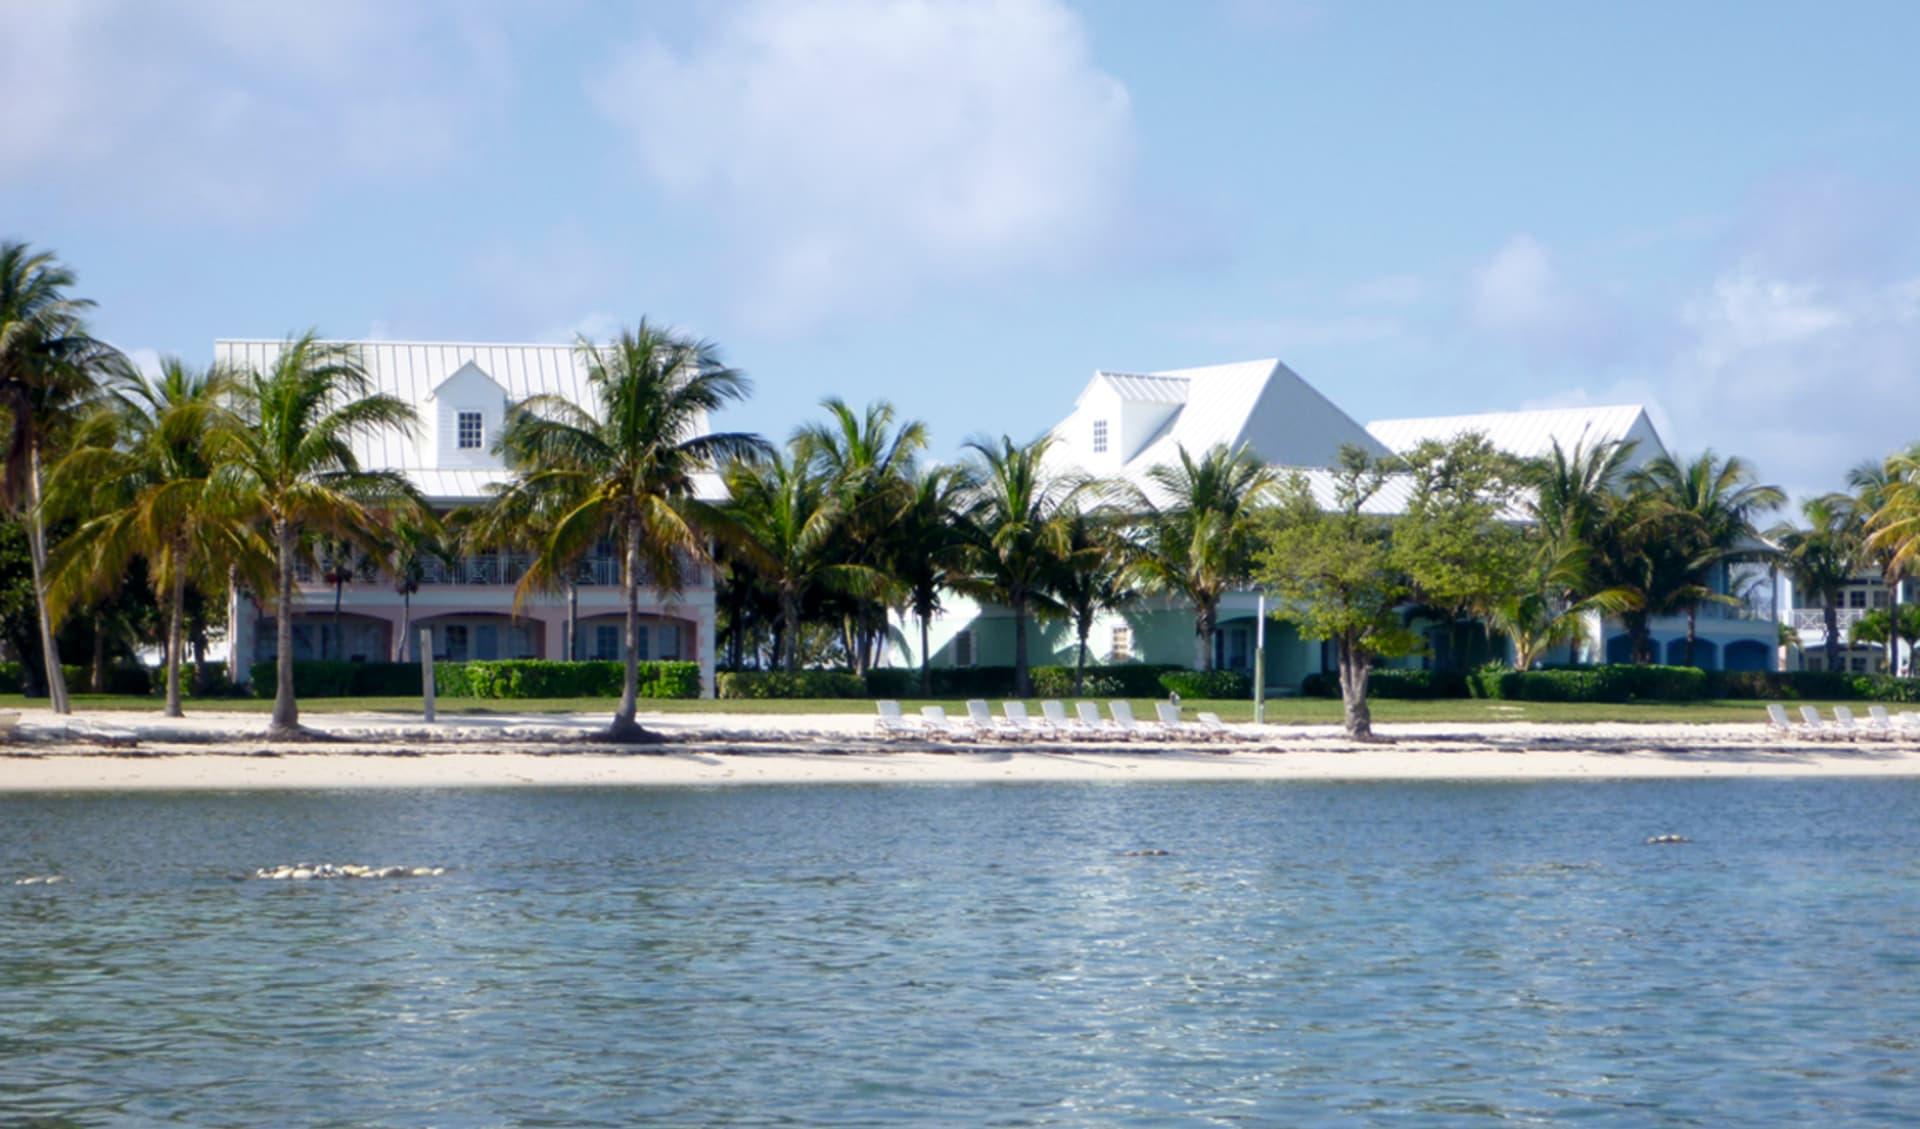 Old Bahama Bay in West End: exterior old bahama bay hotelansicht palmen meer